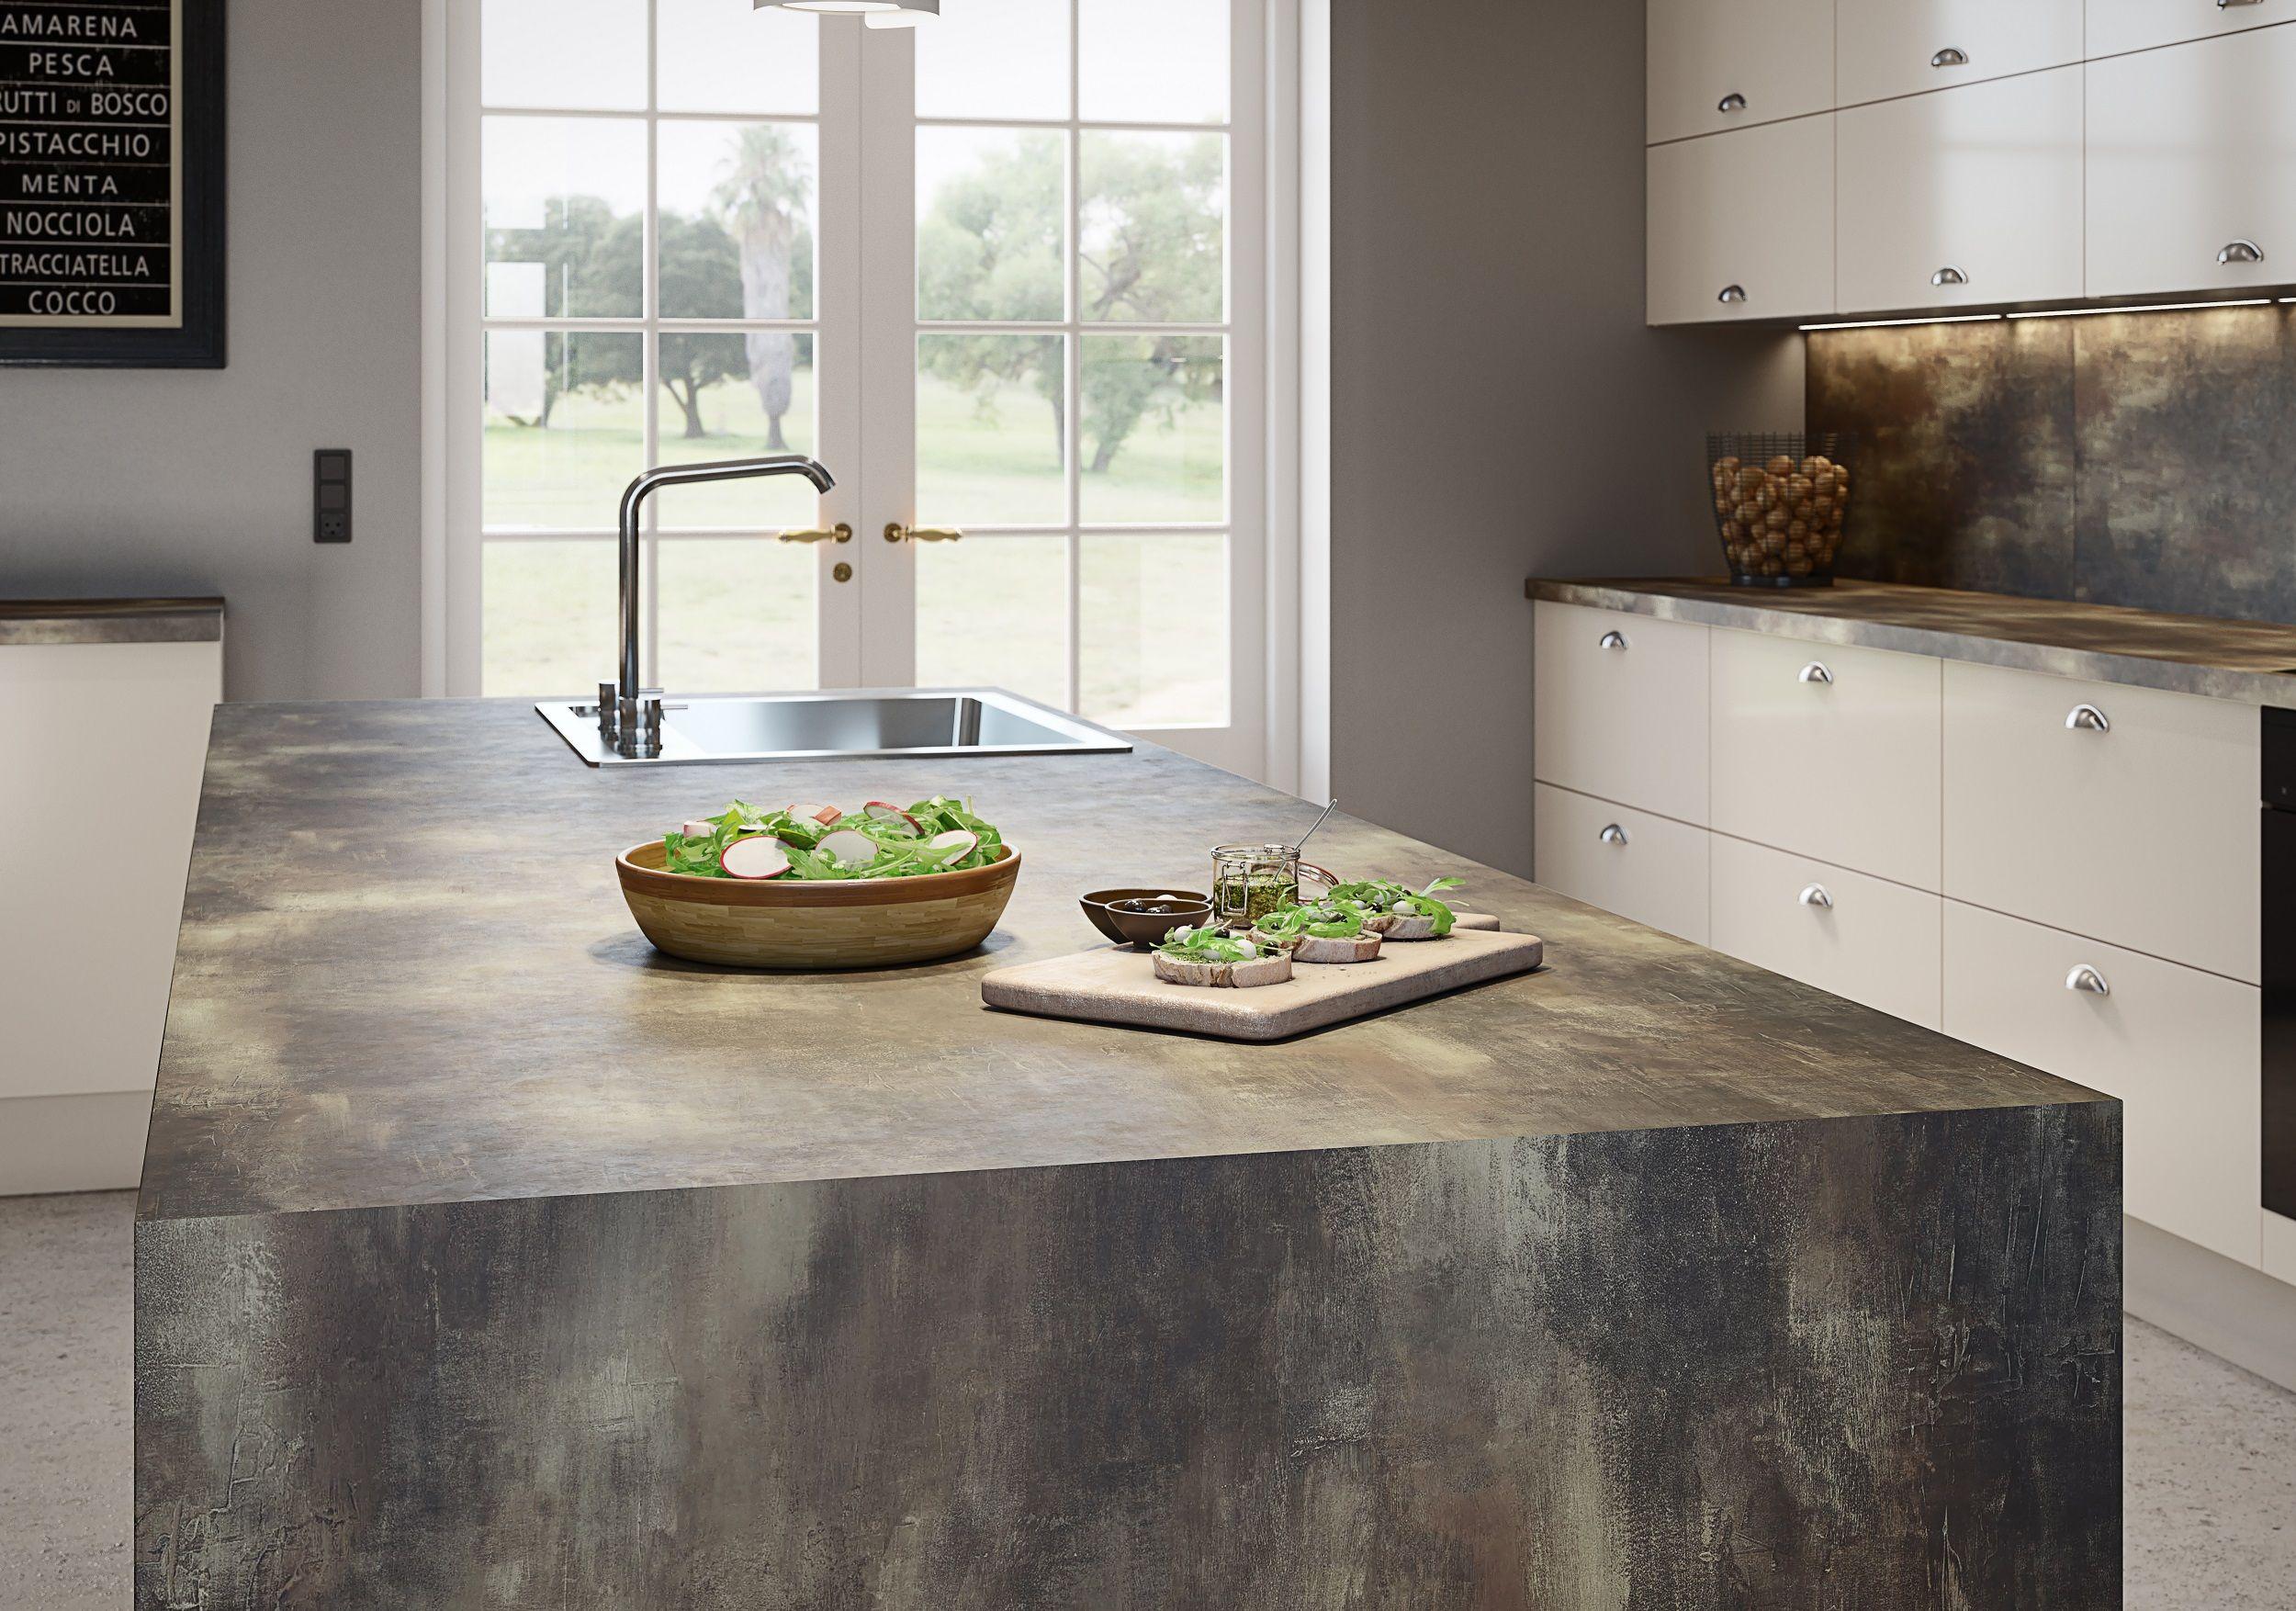 Bushboard Omega Mon Valley In 2020 Laminate Worktop Kitchen Edge Design